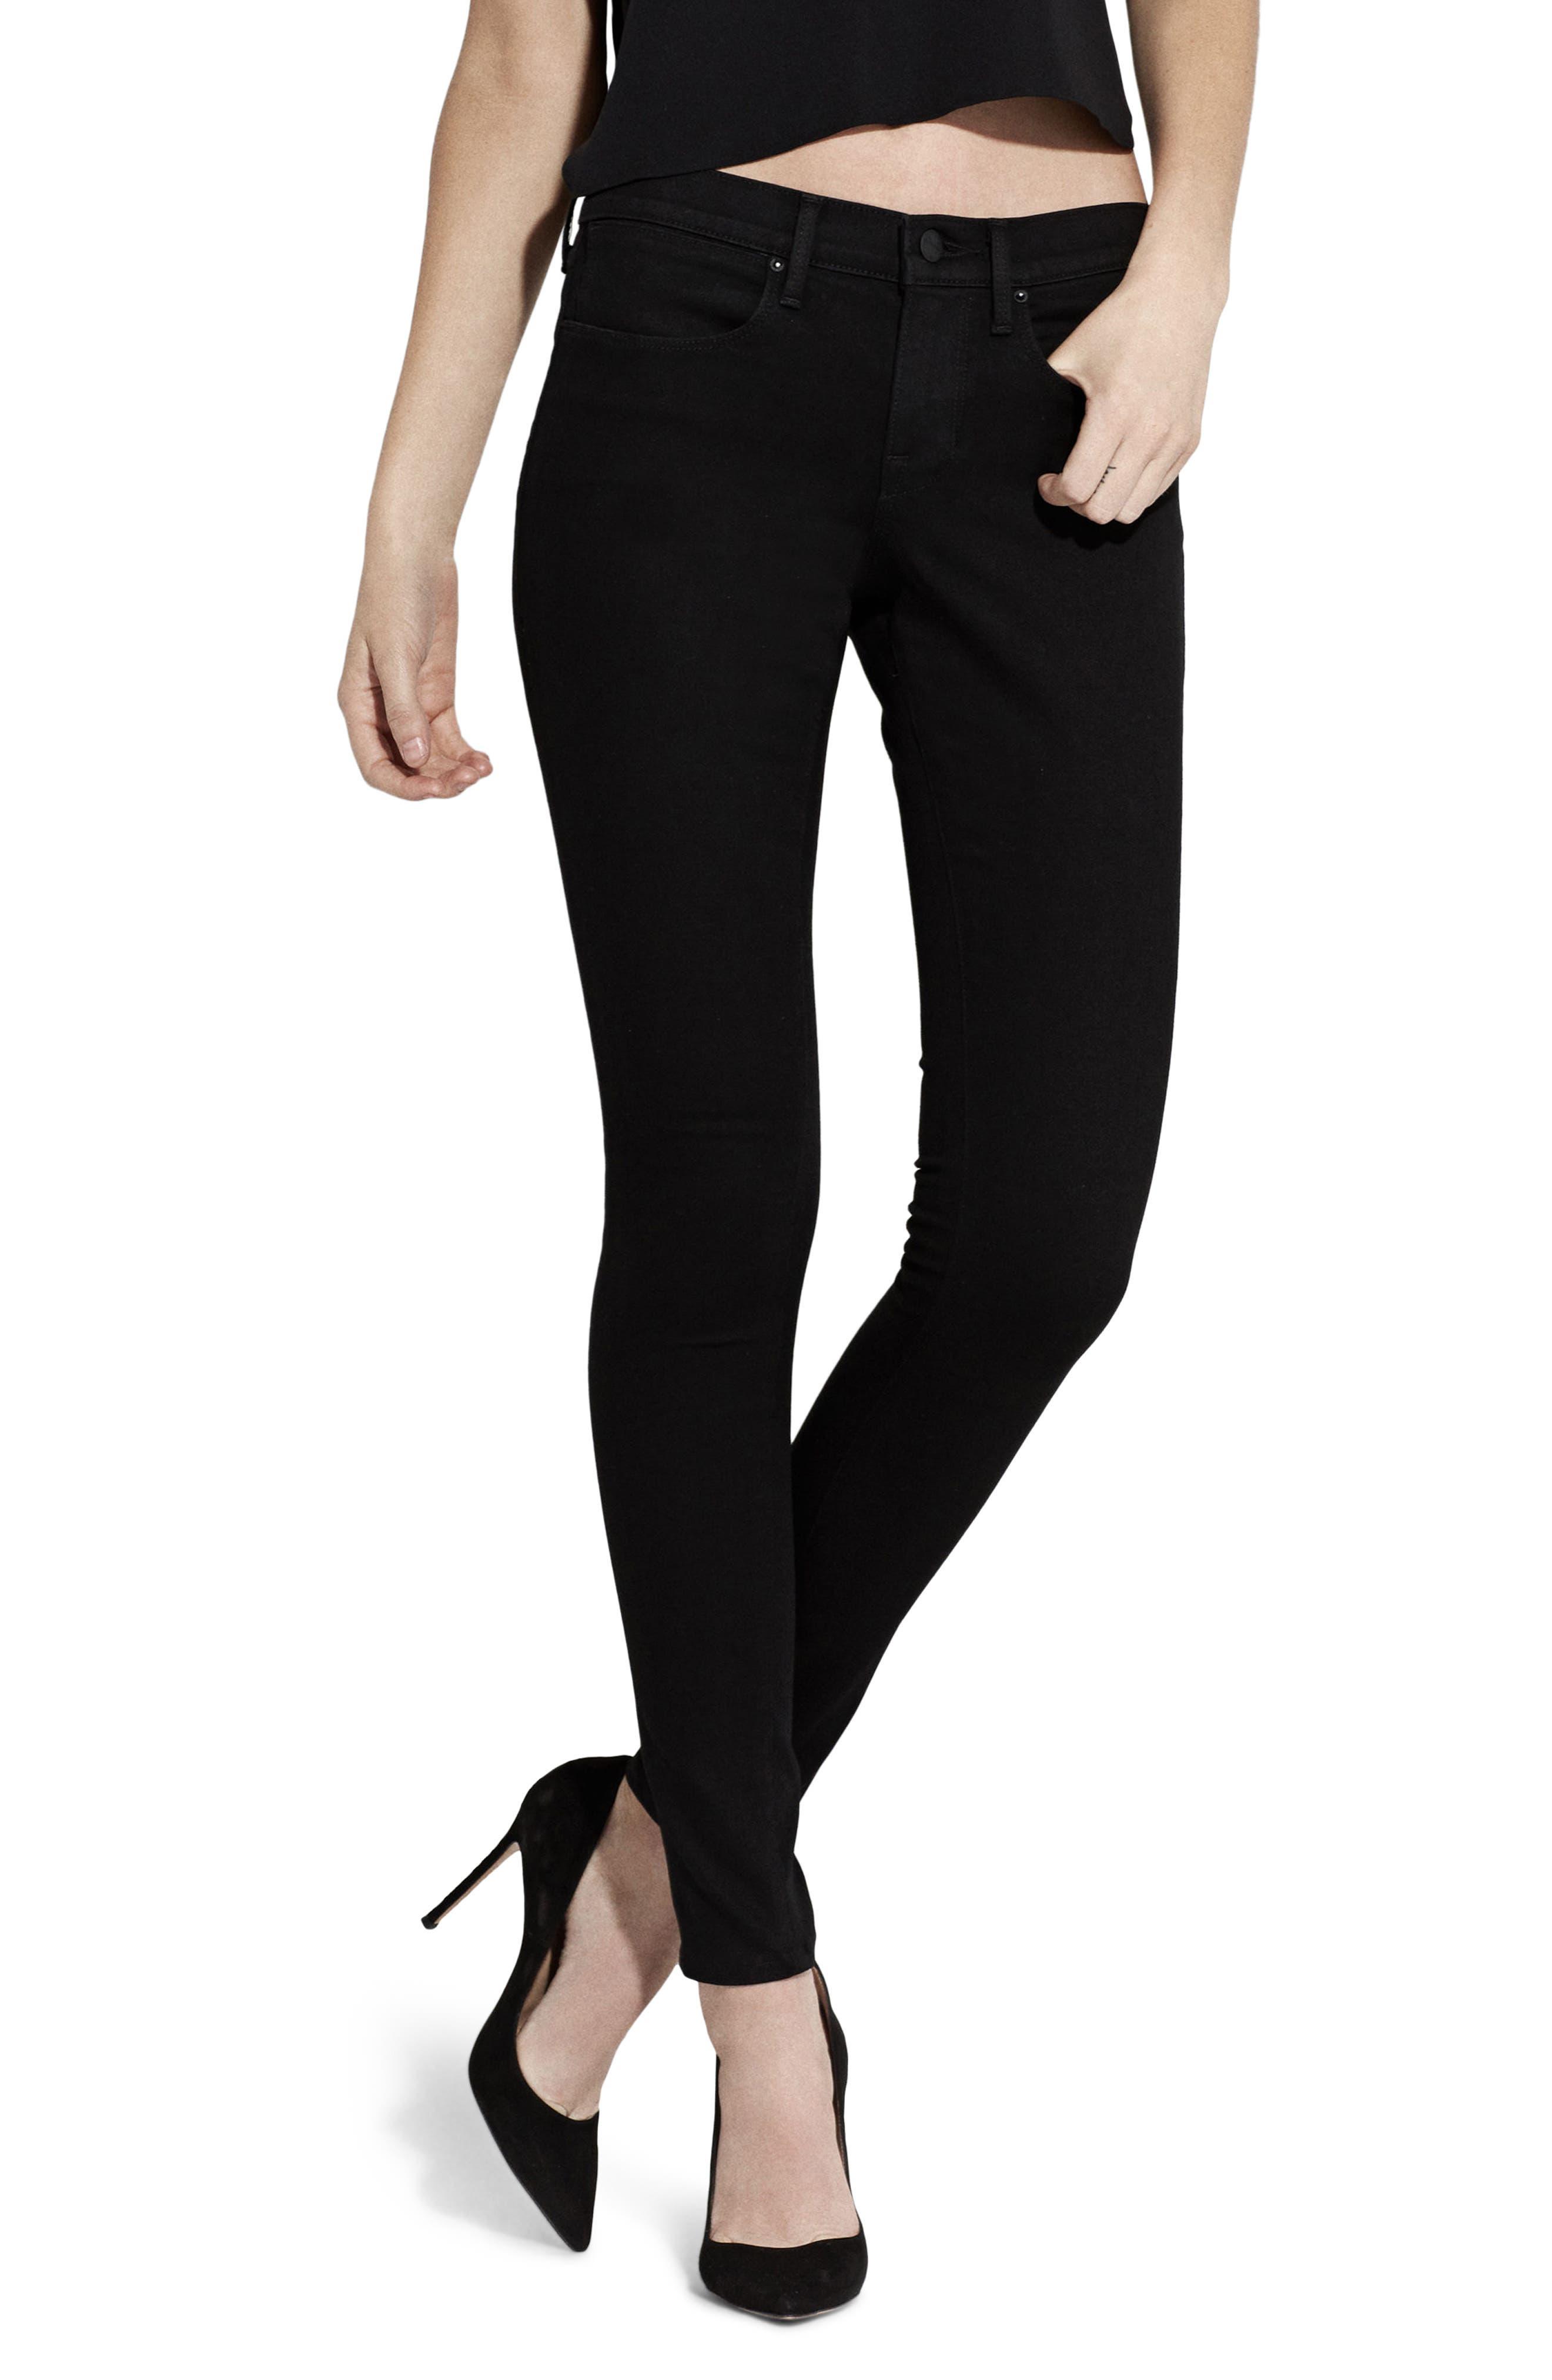 Alternate Image 1 Selected - AYR The Skinny Jeans (Jet Black)